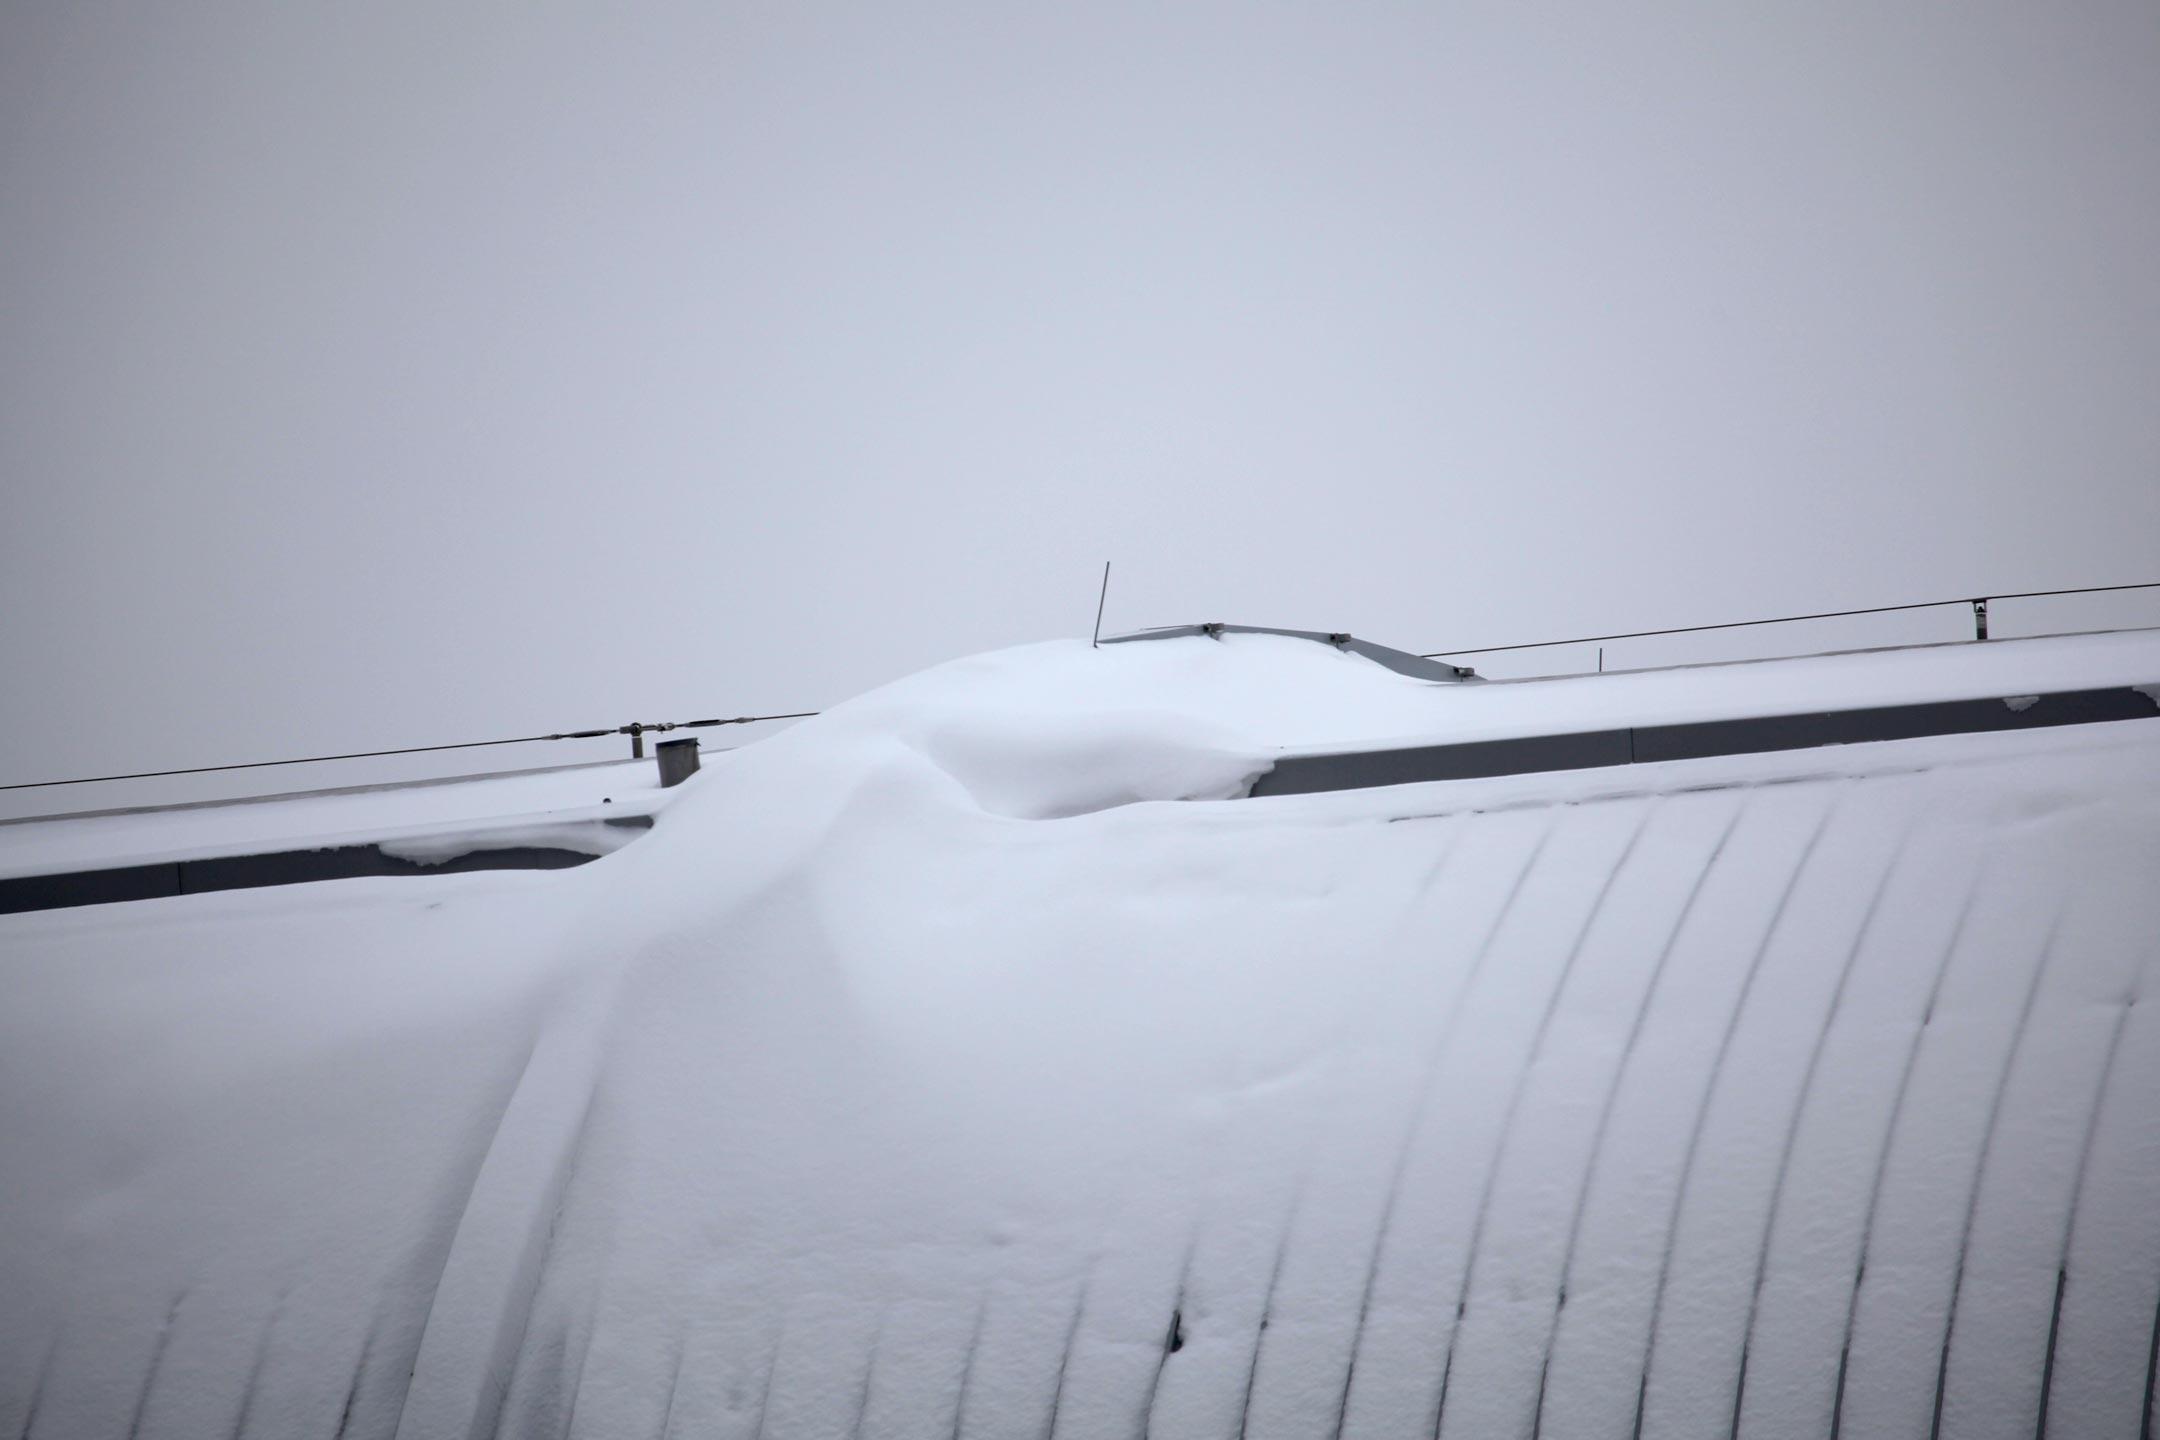 schneeflug iss dome 03